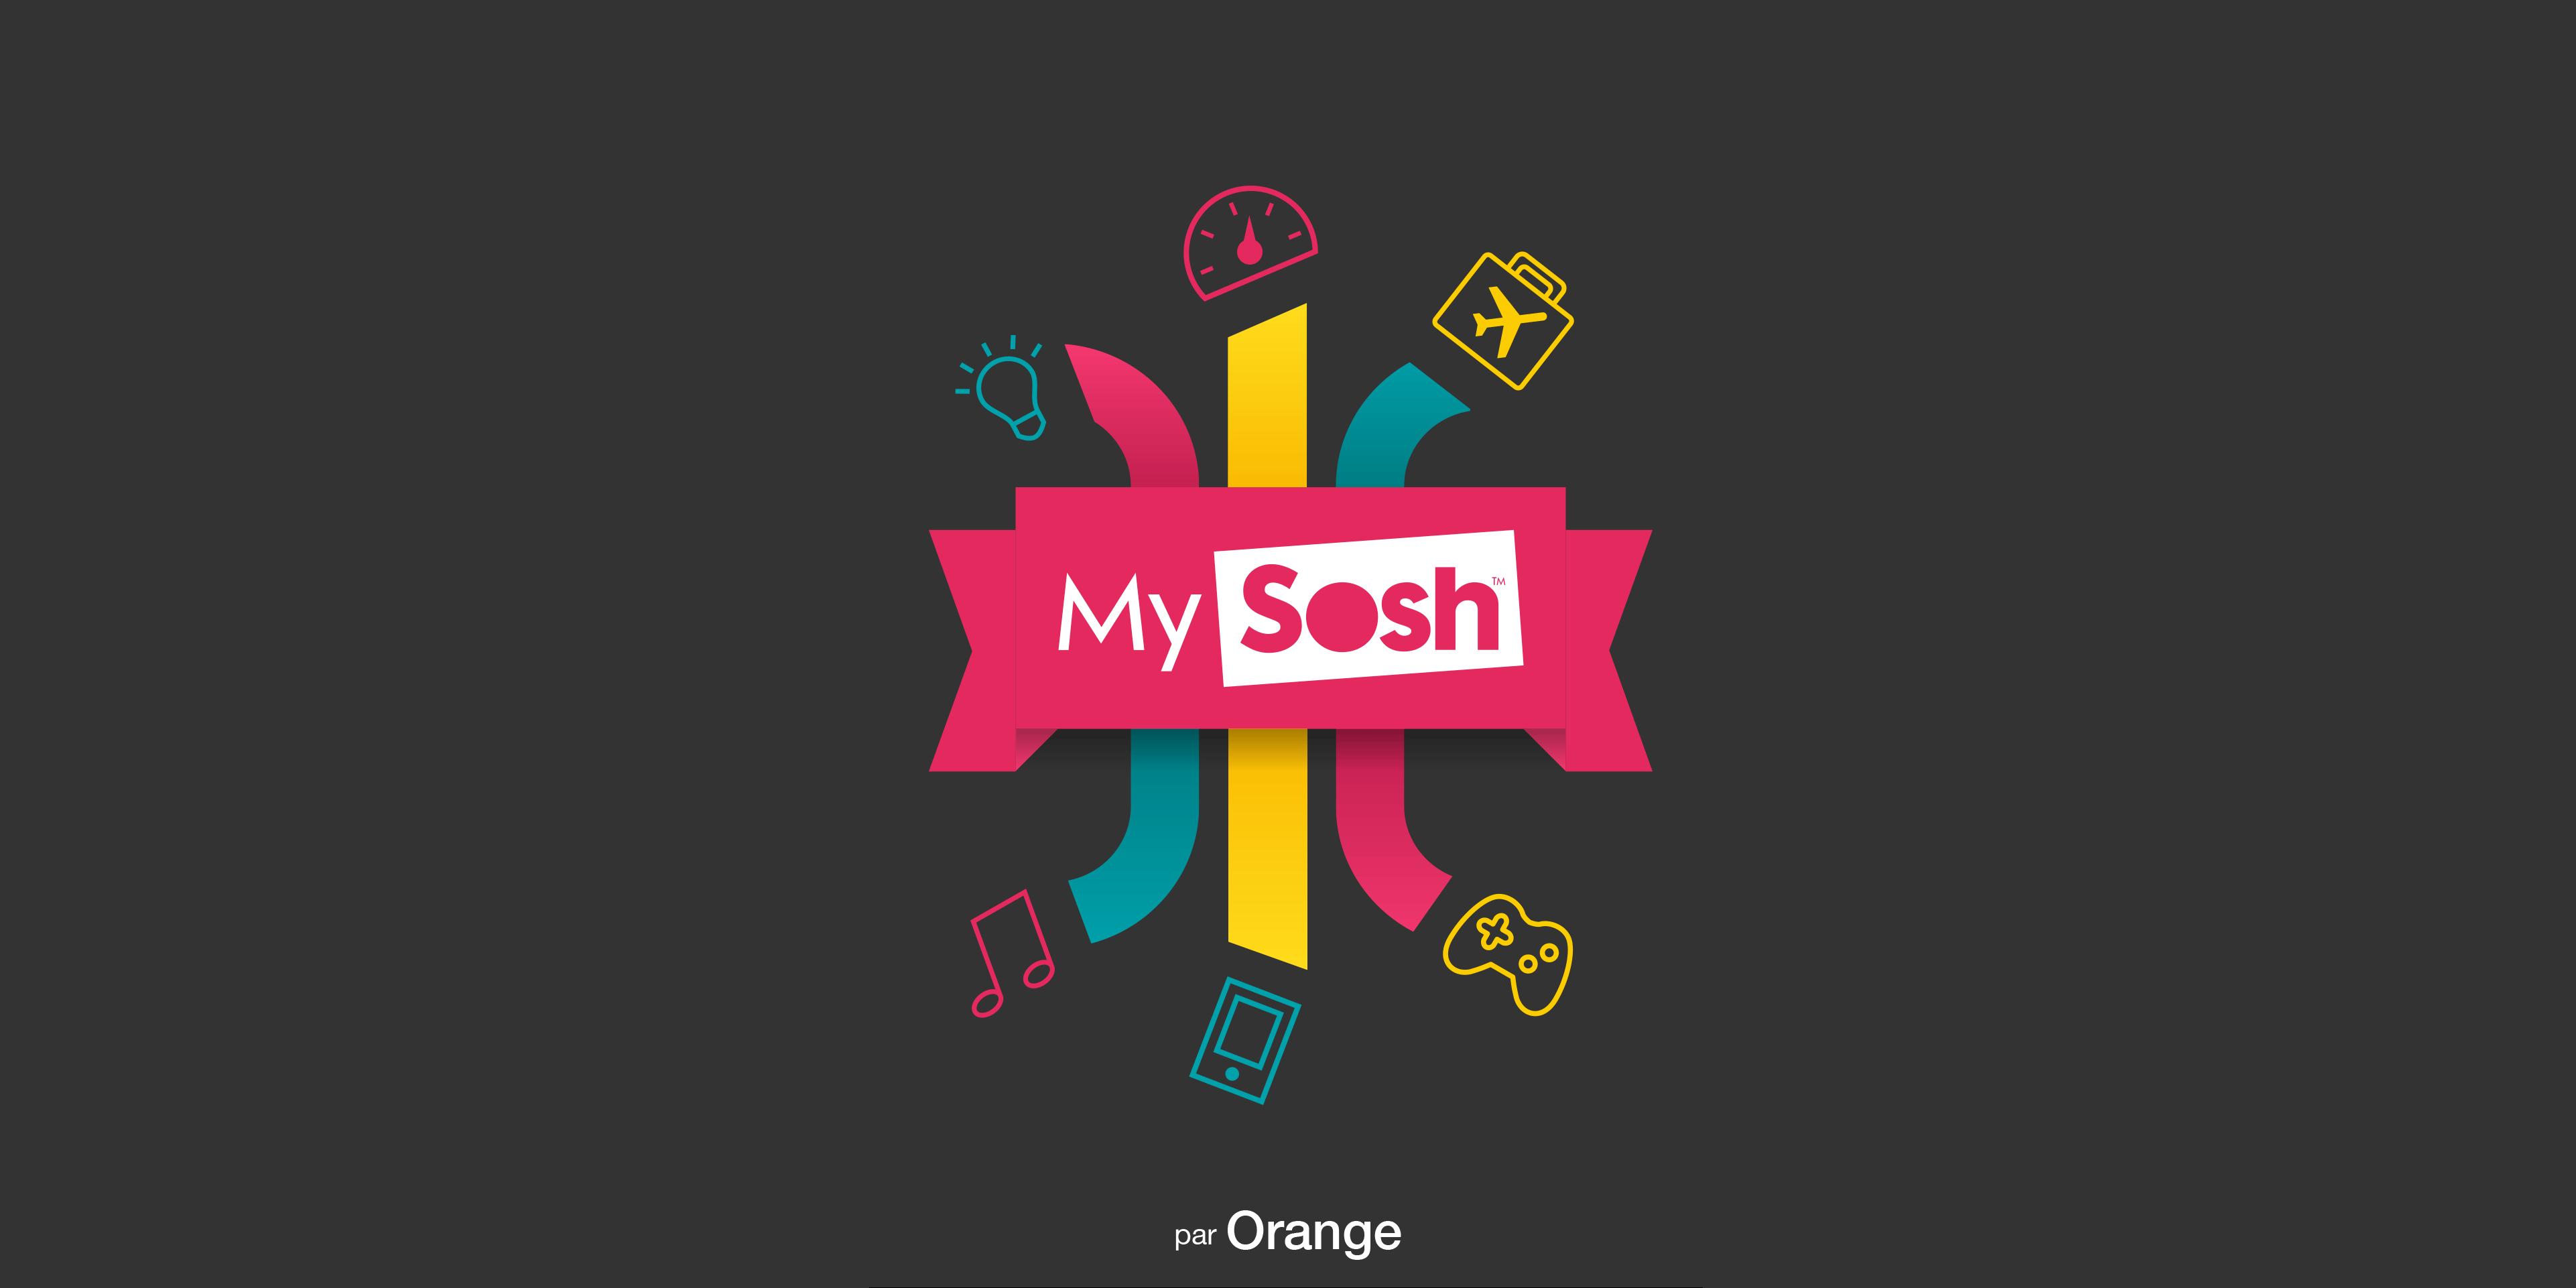 My Sosh